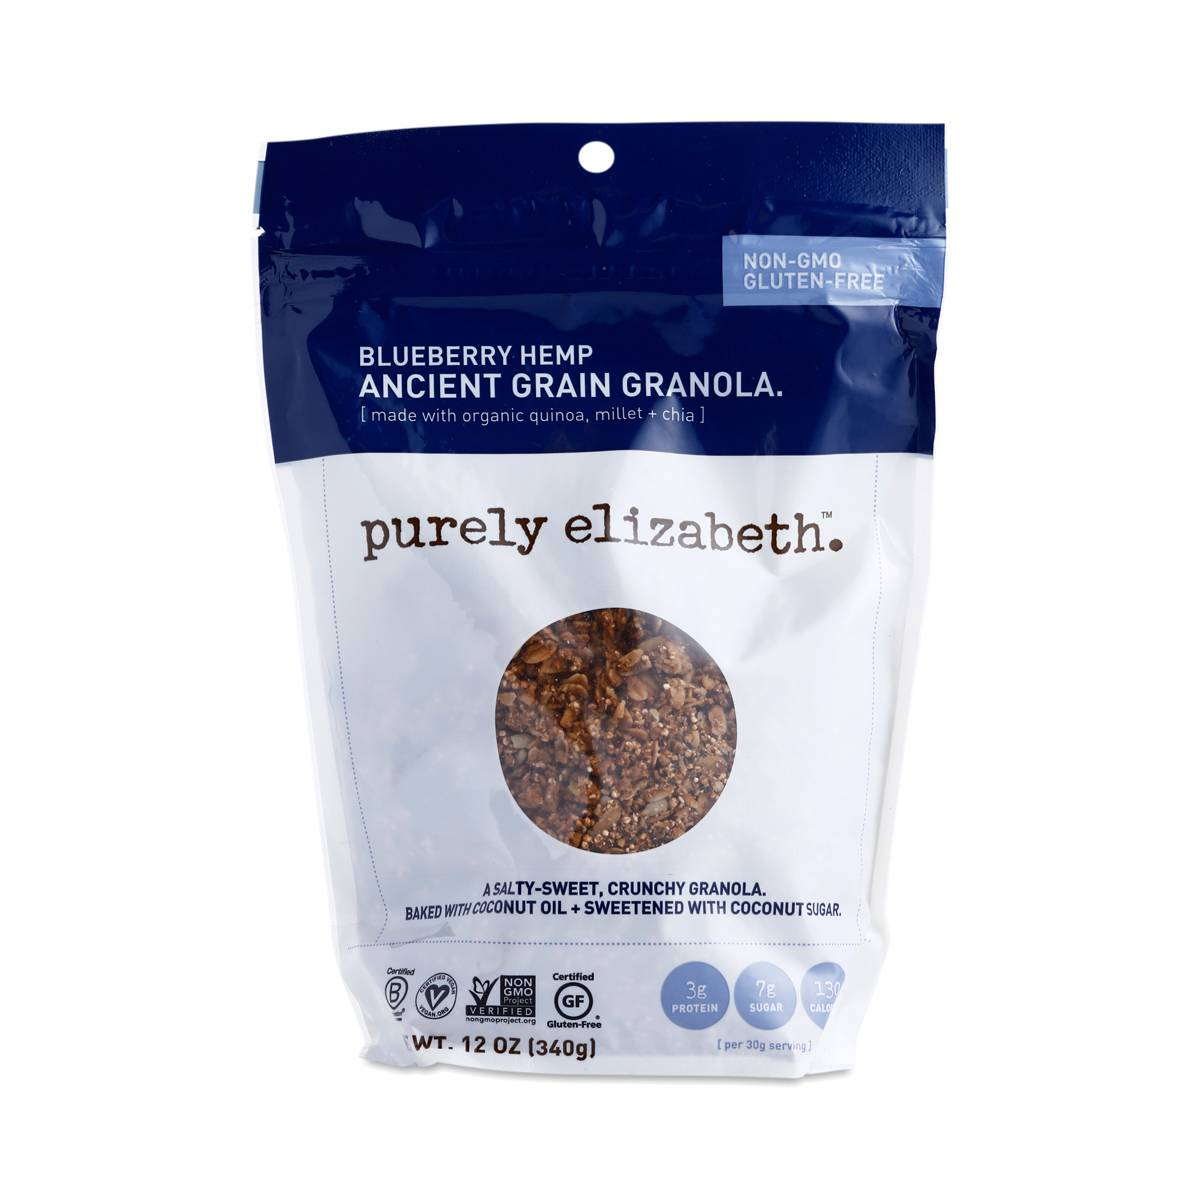 Purely Elizabeth Ancient Grain Granola Cereal Blueberry Hemp - Thrive Market